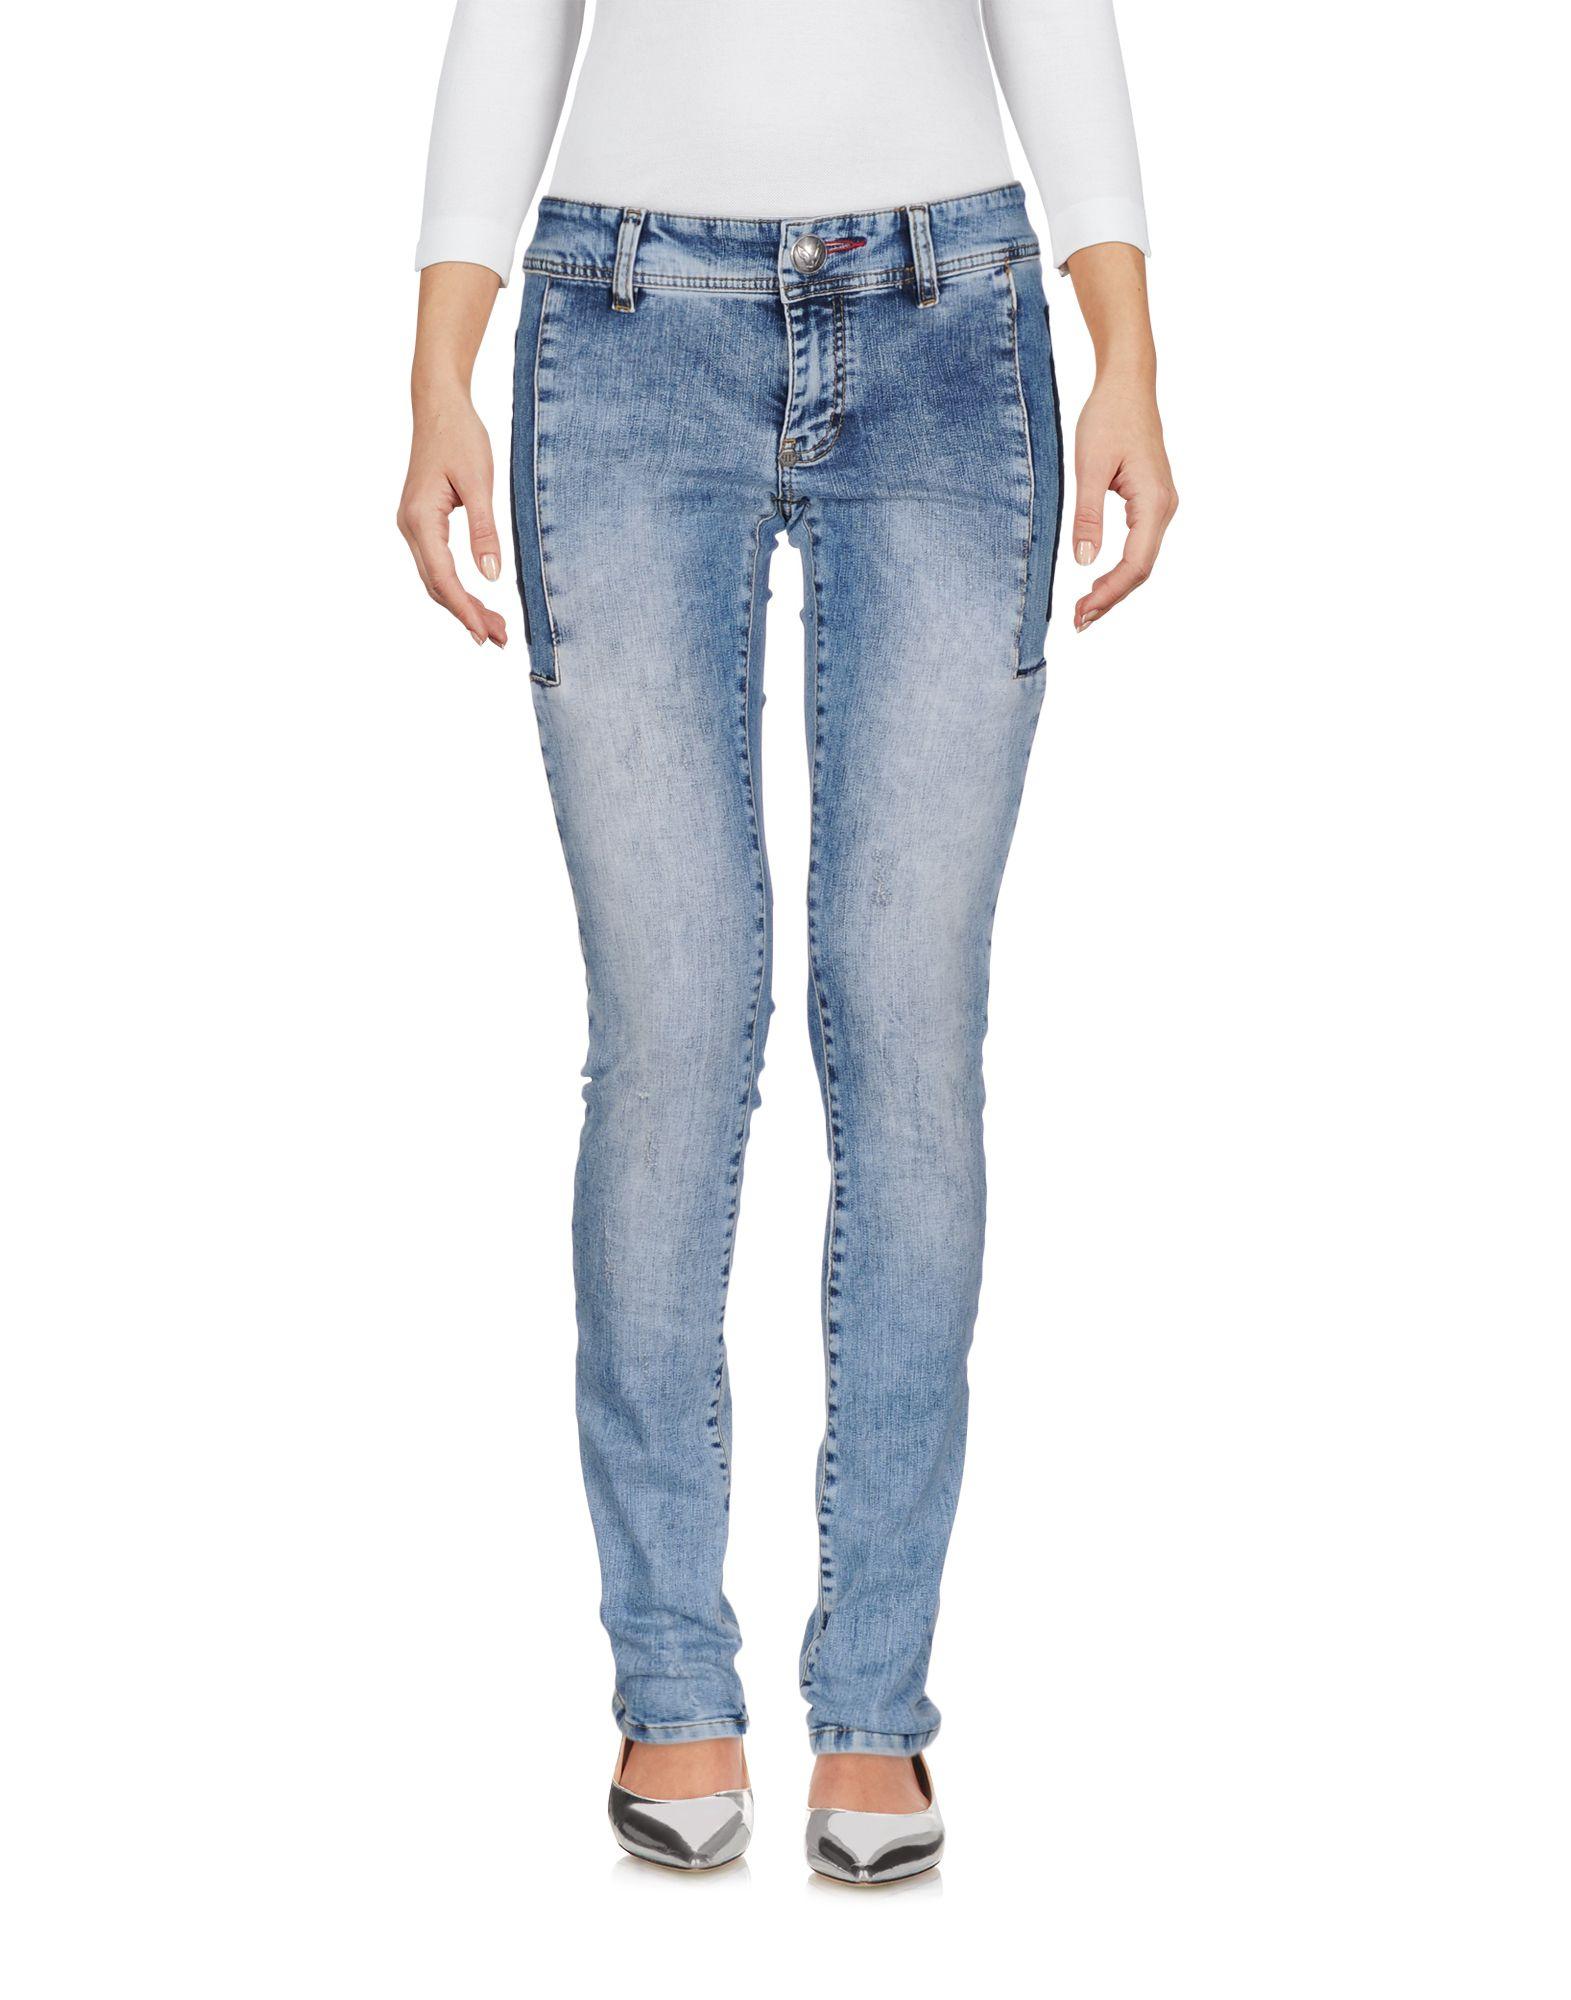 ФОТО philipp plein джинсовые брюки